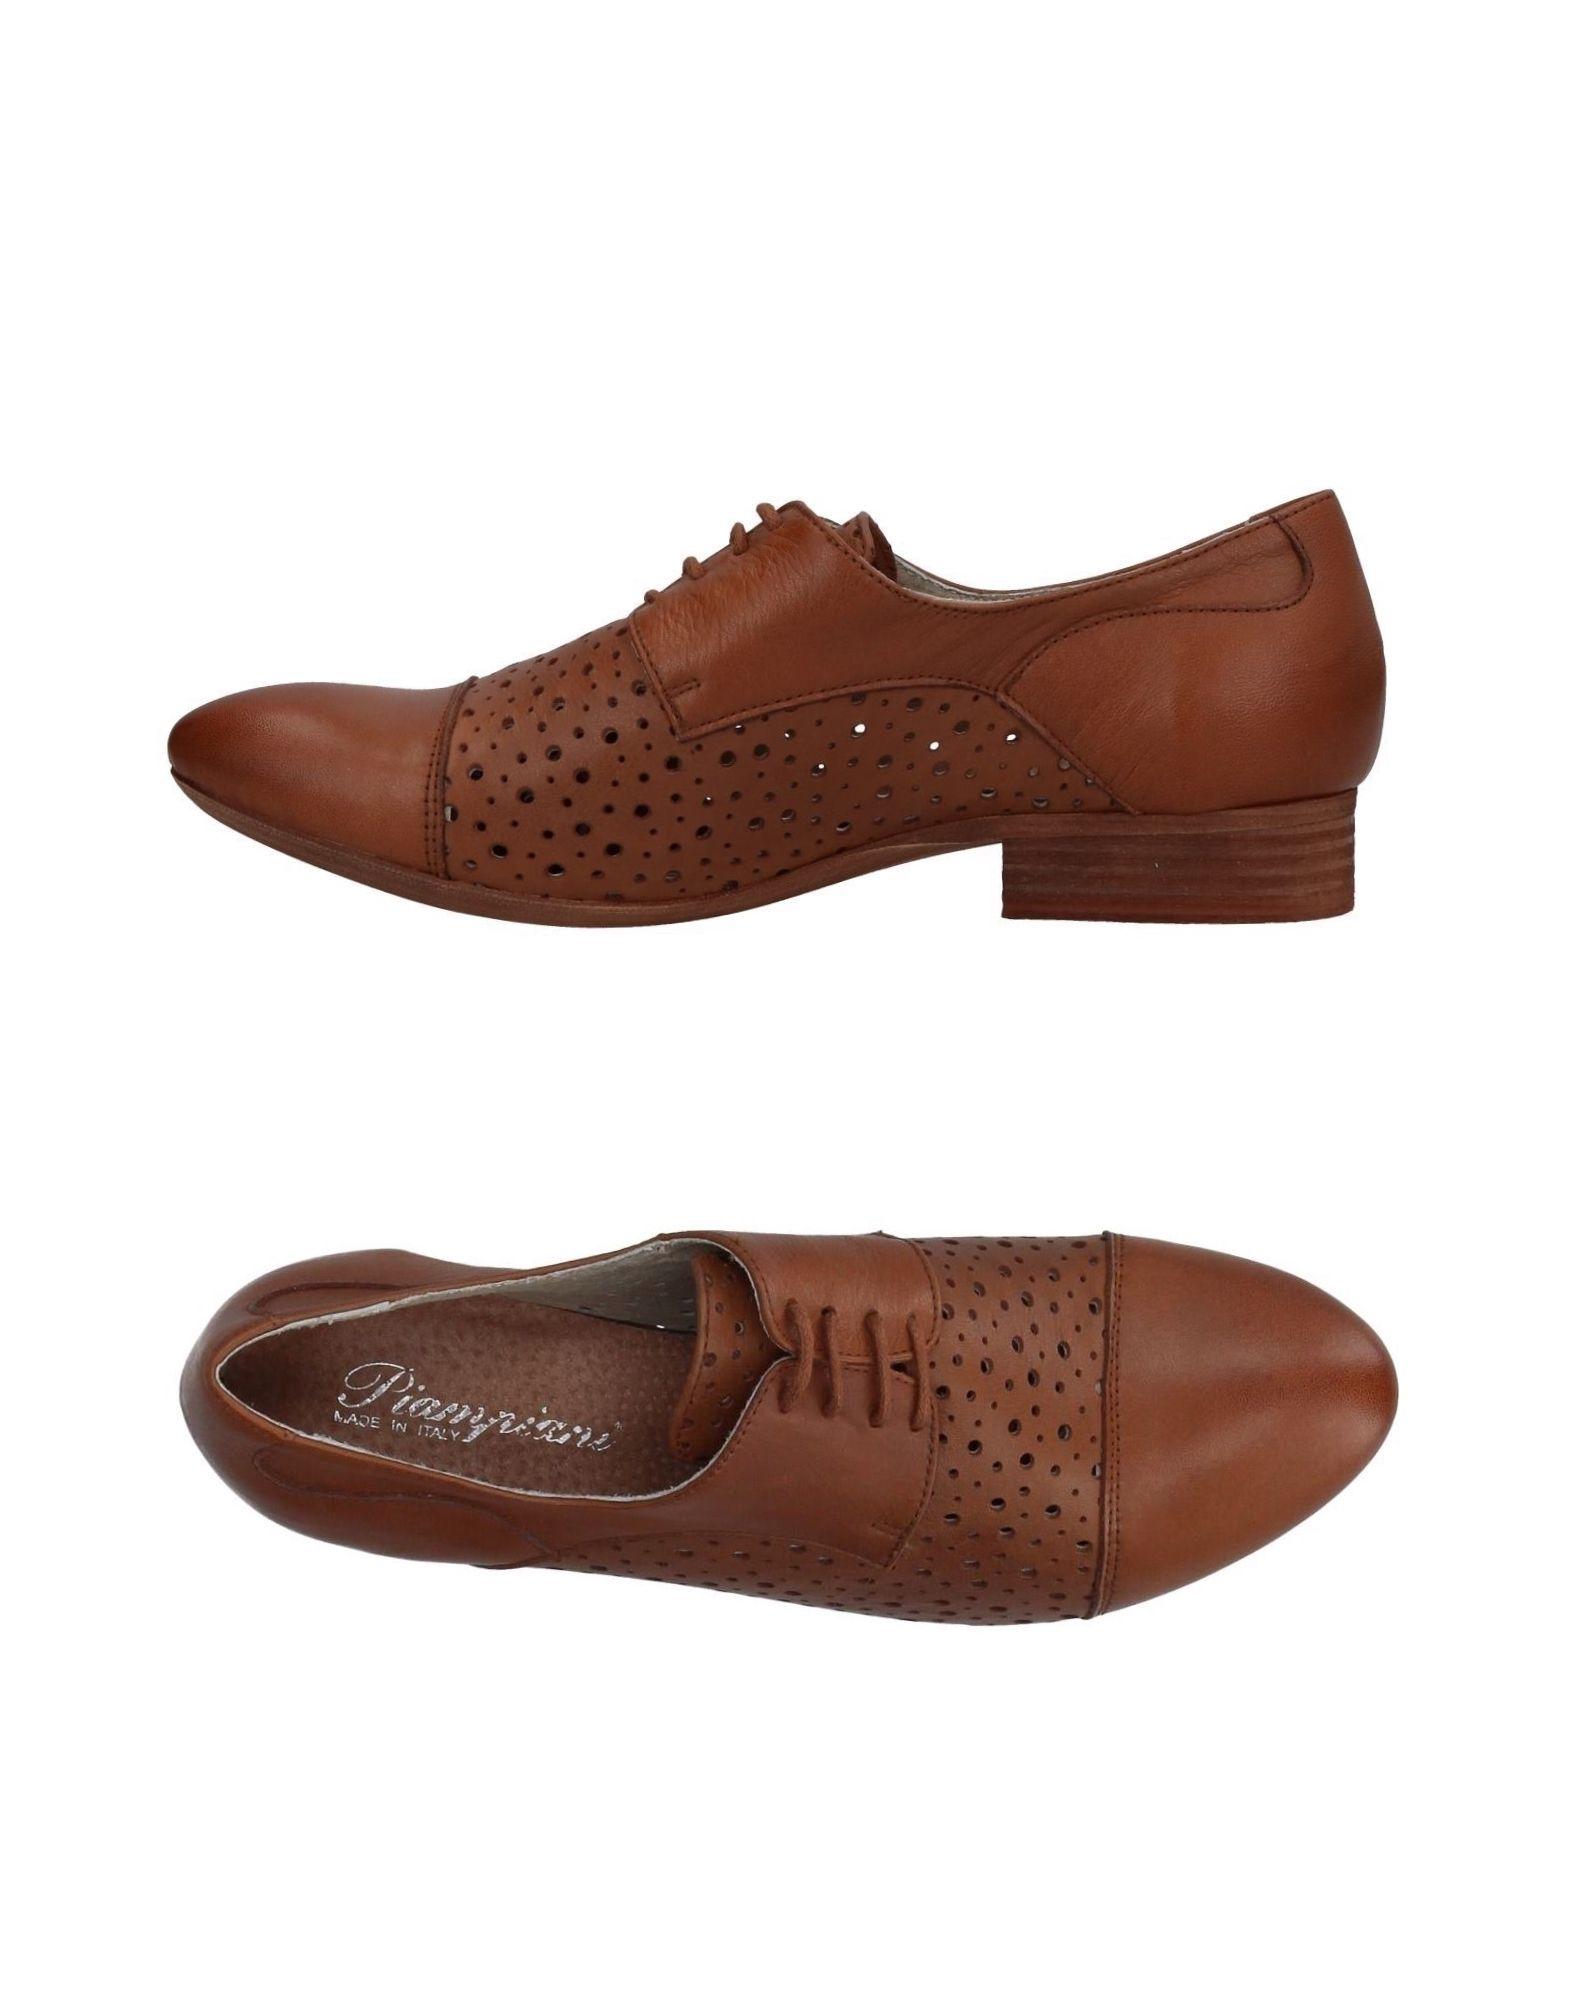 PIAMPIANI Обувь на шнурках первый внутри обувь обувь обувь обувь обувь обувь обувь обувь обувь 8a2549 мужская армия green 40 метров